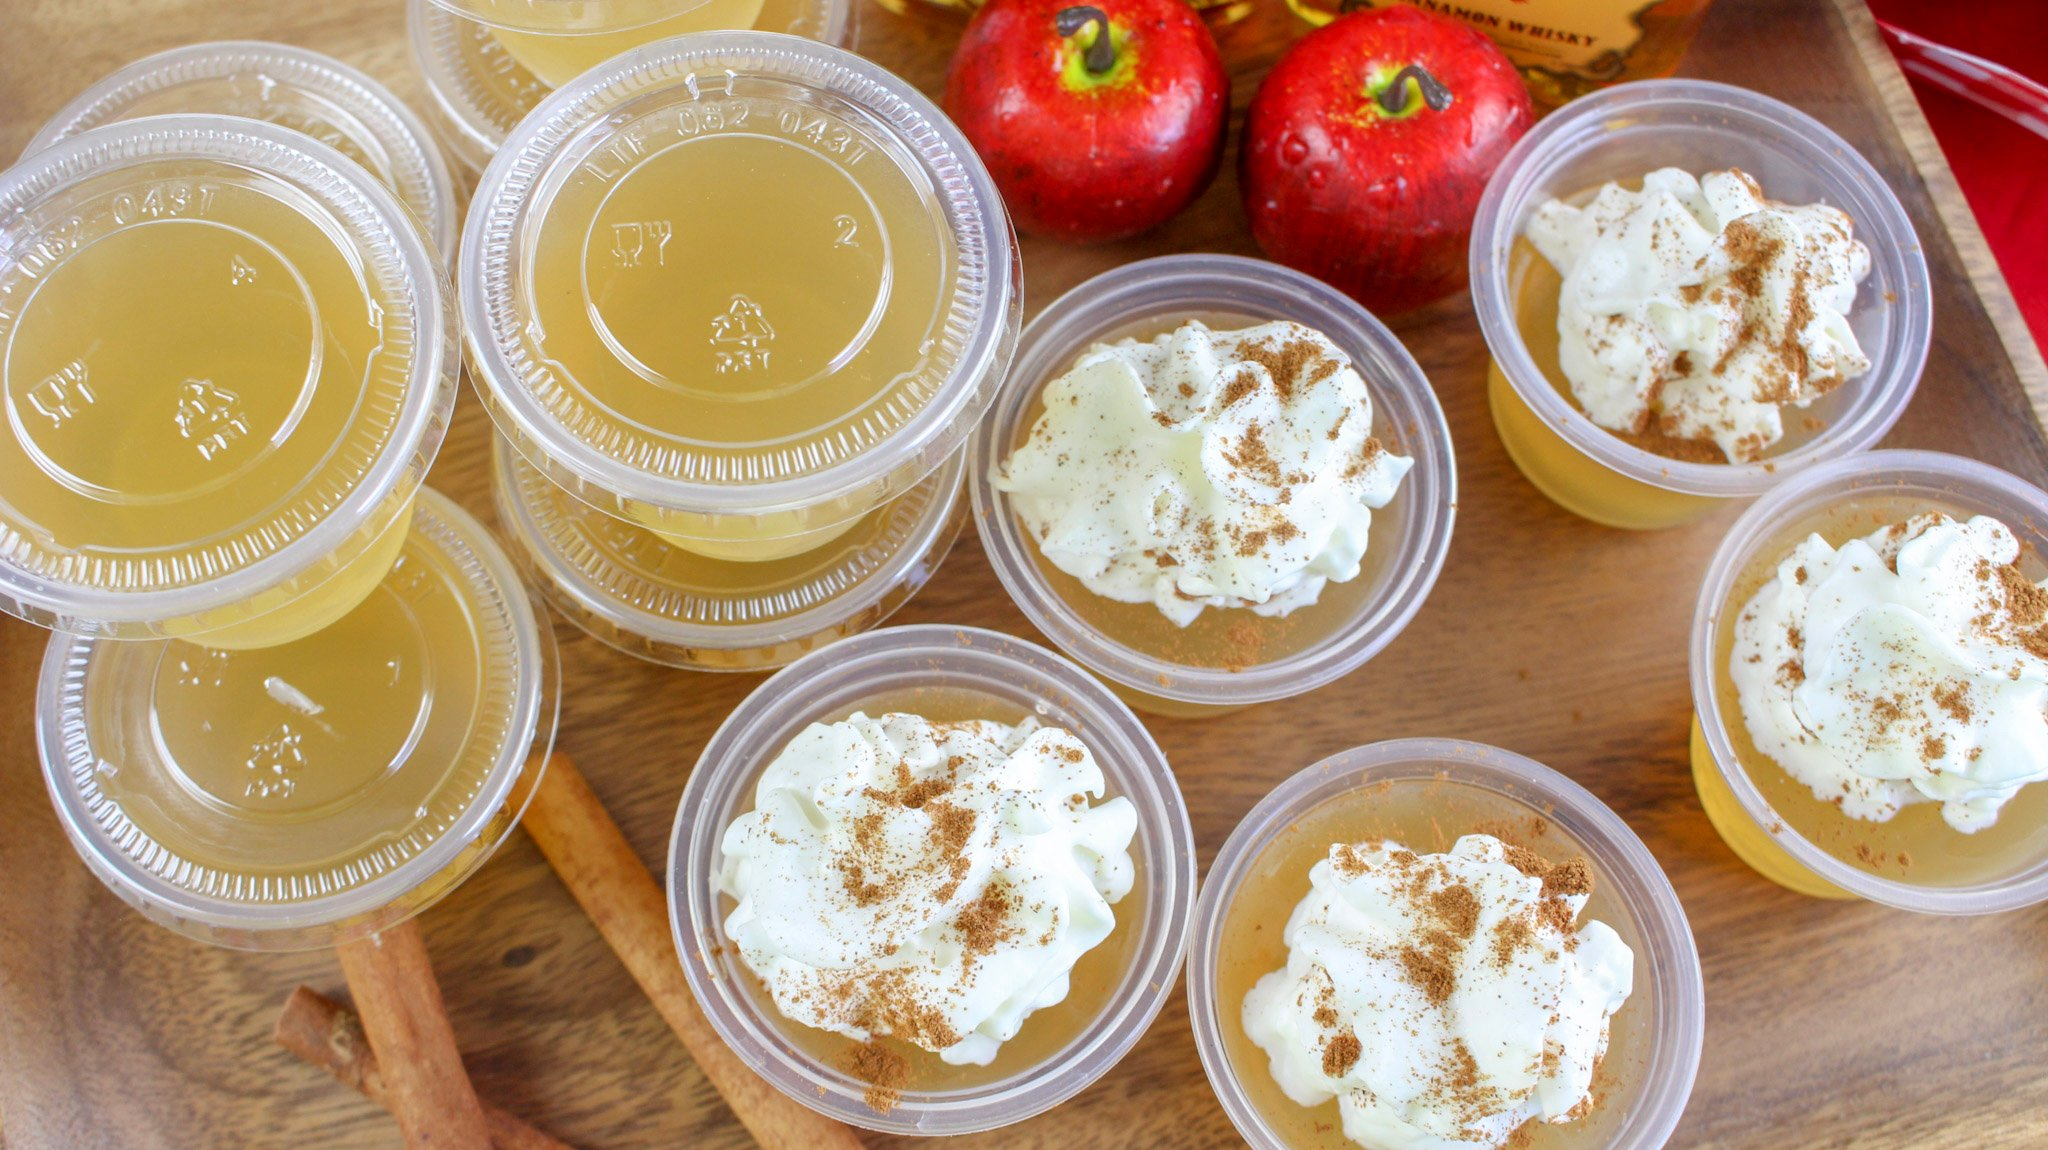 Apple Pie Jello Shots